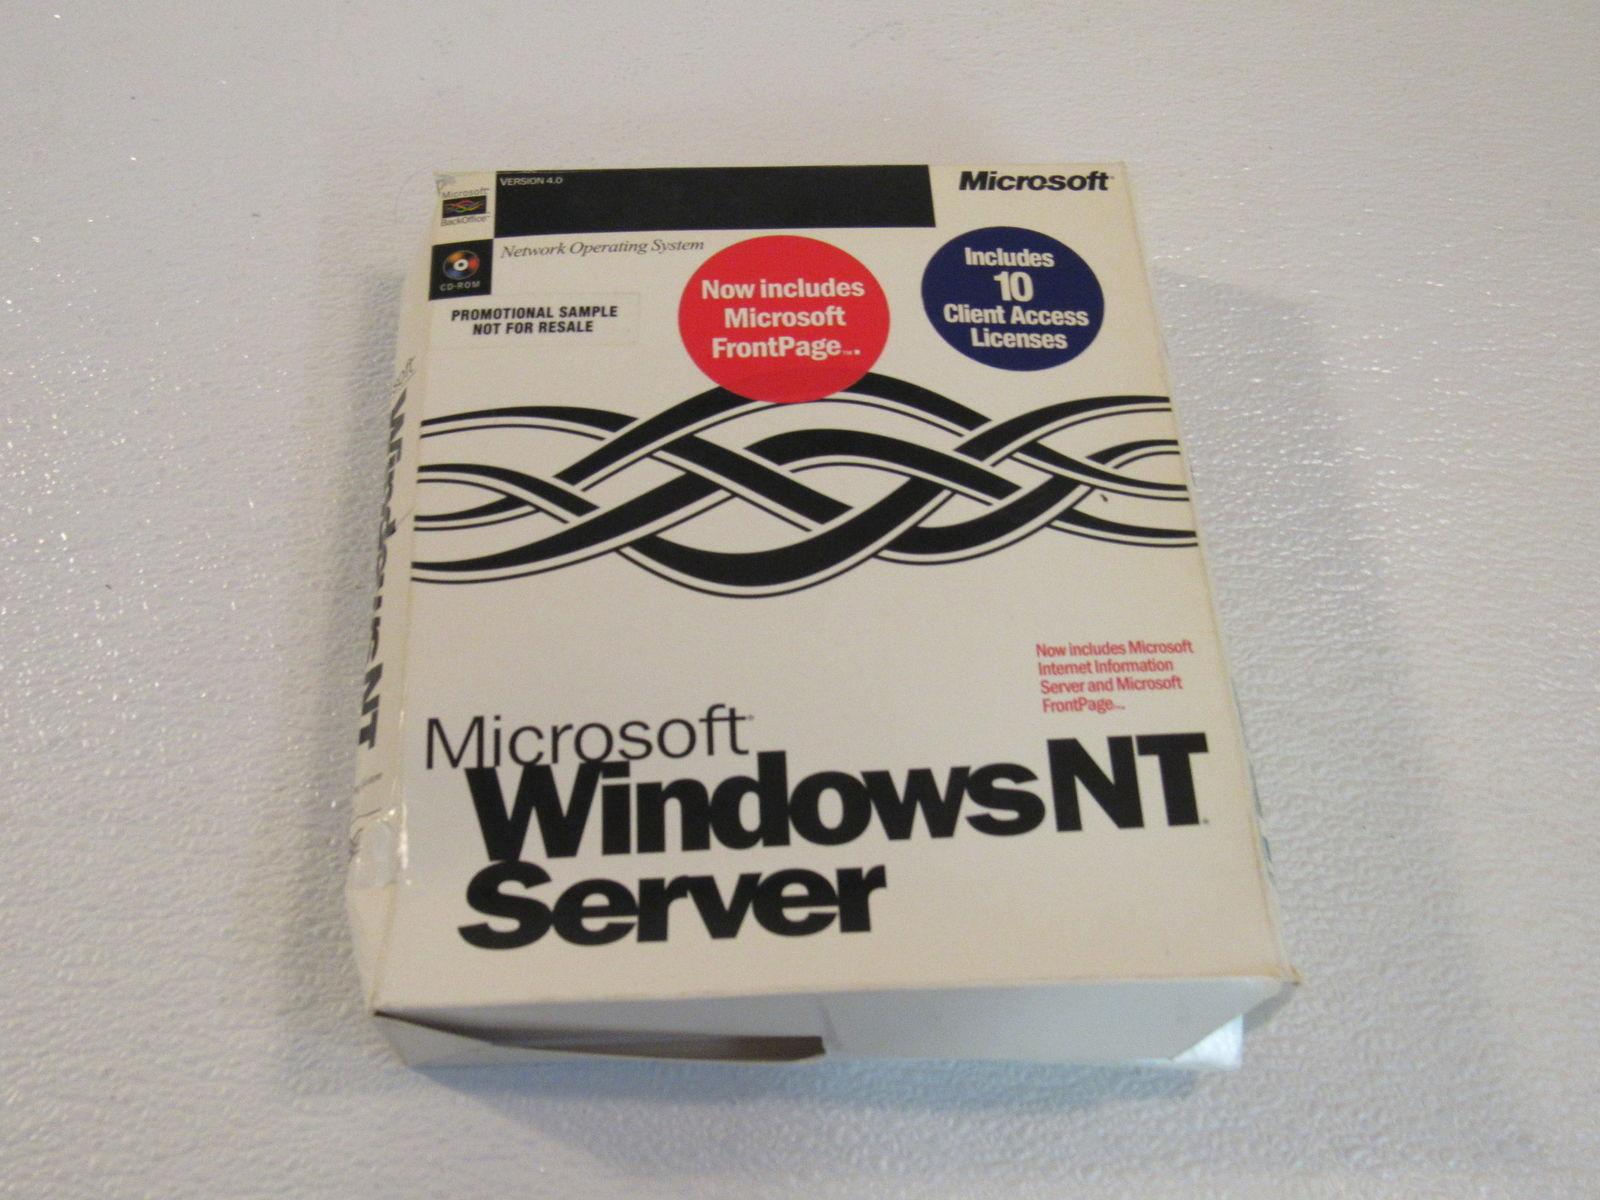 Microsoft Windows NT Server Operating Software 3 Floppy Disk Version 4.0 94339